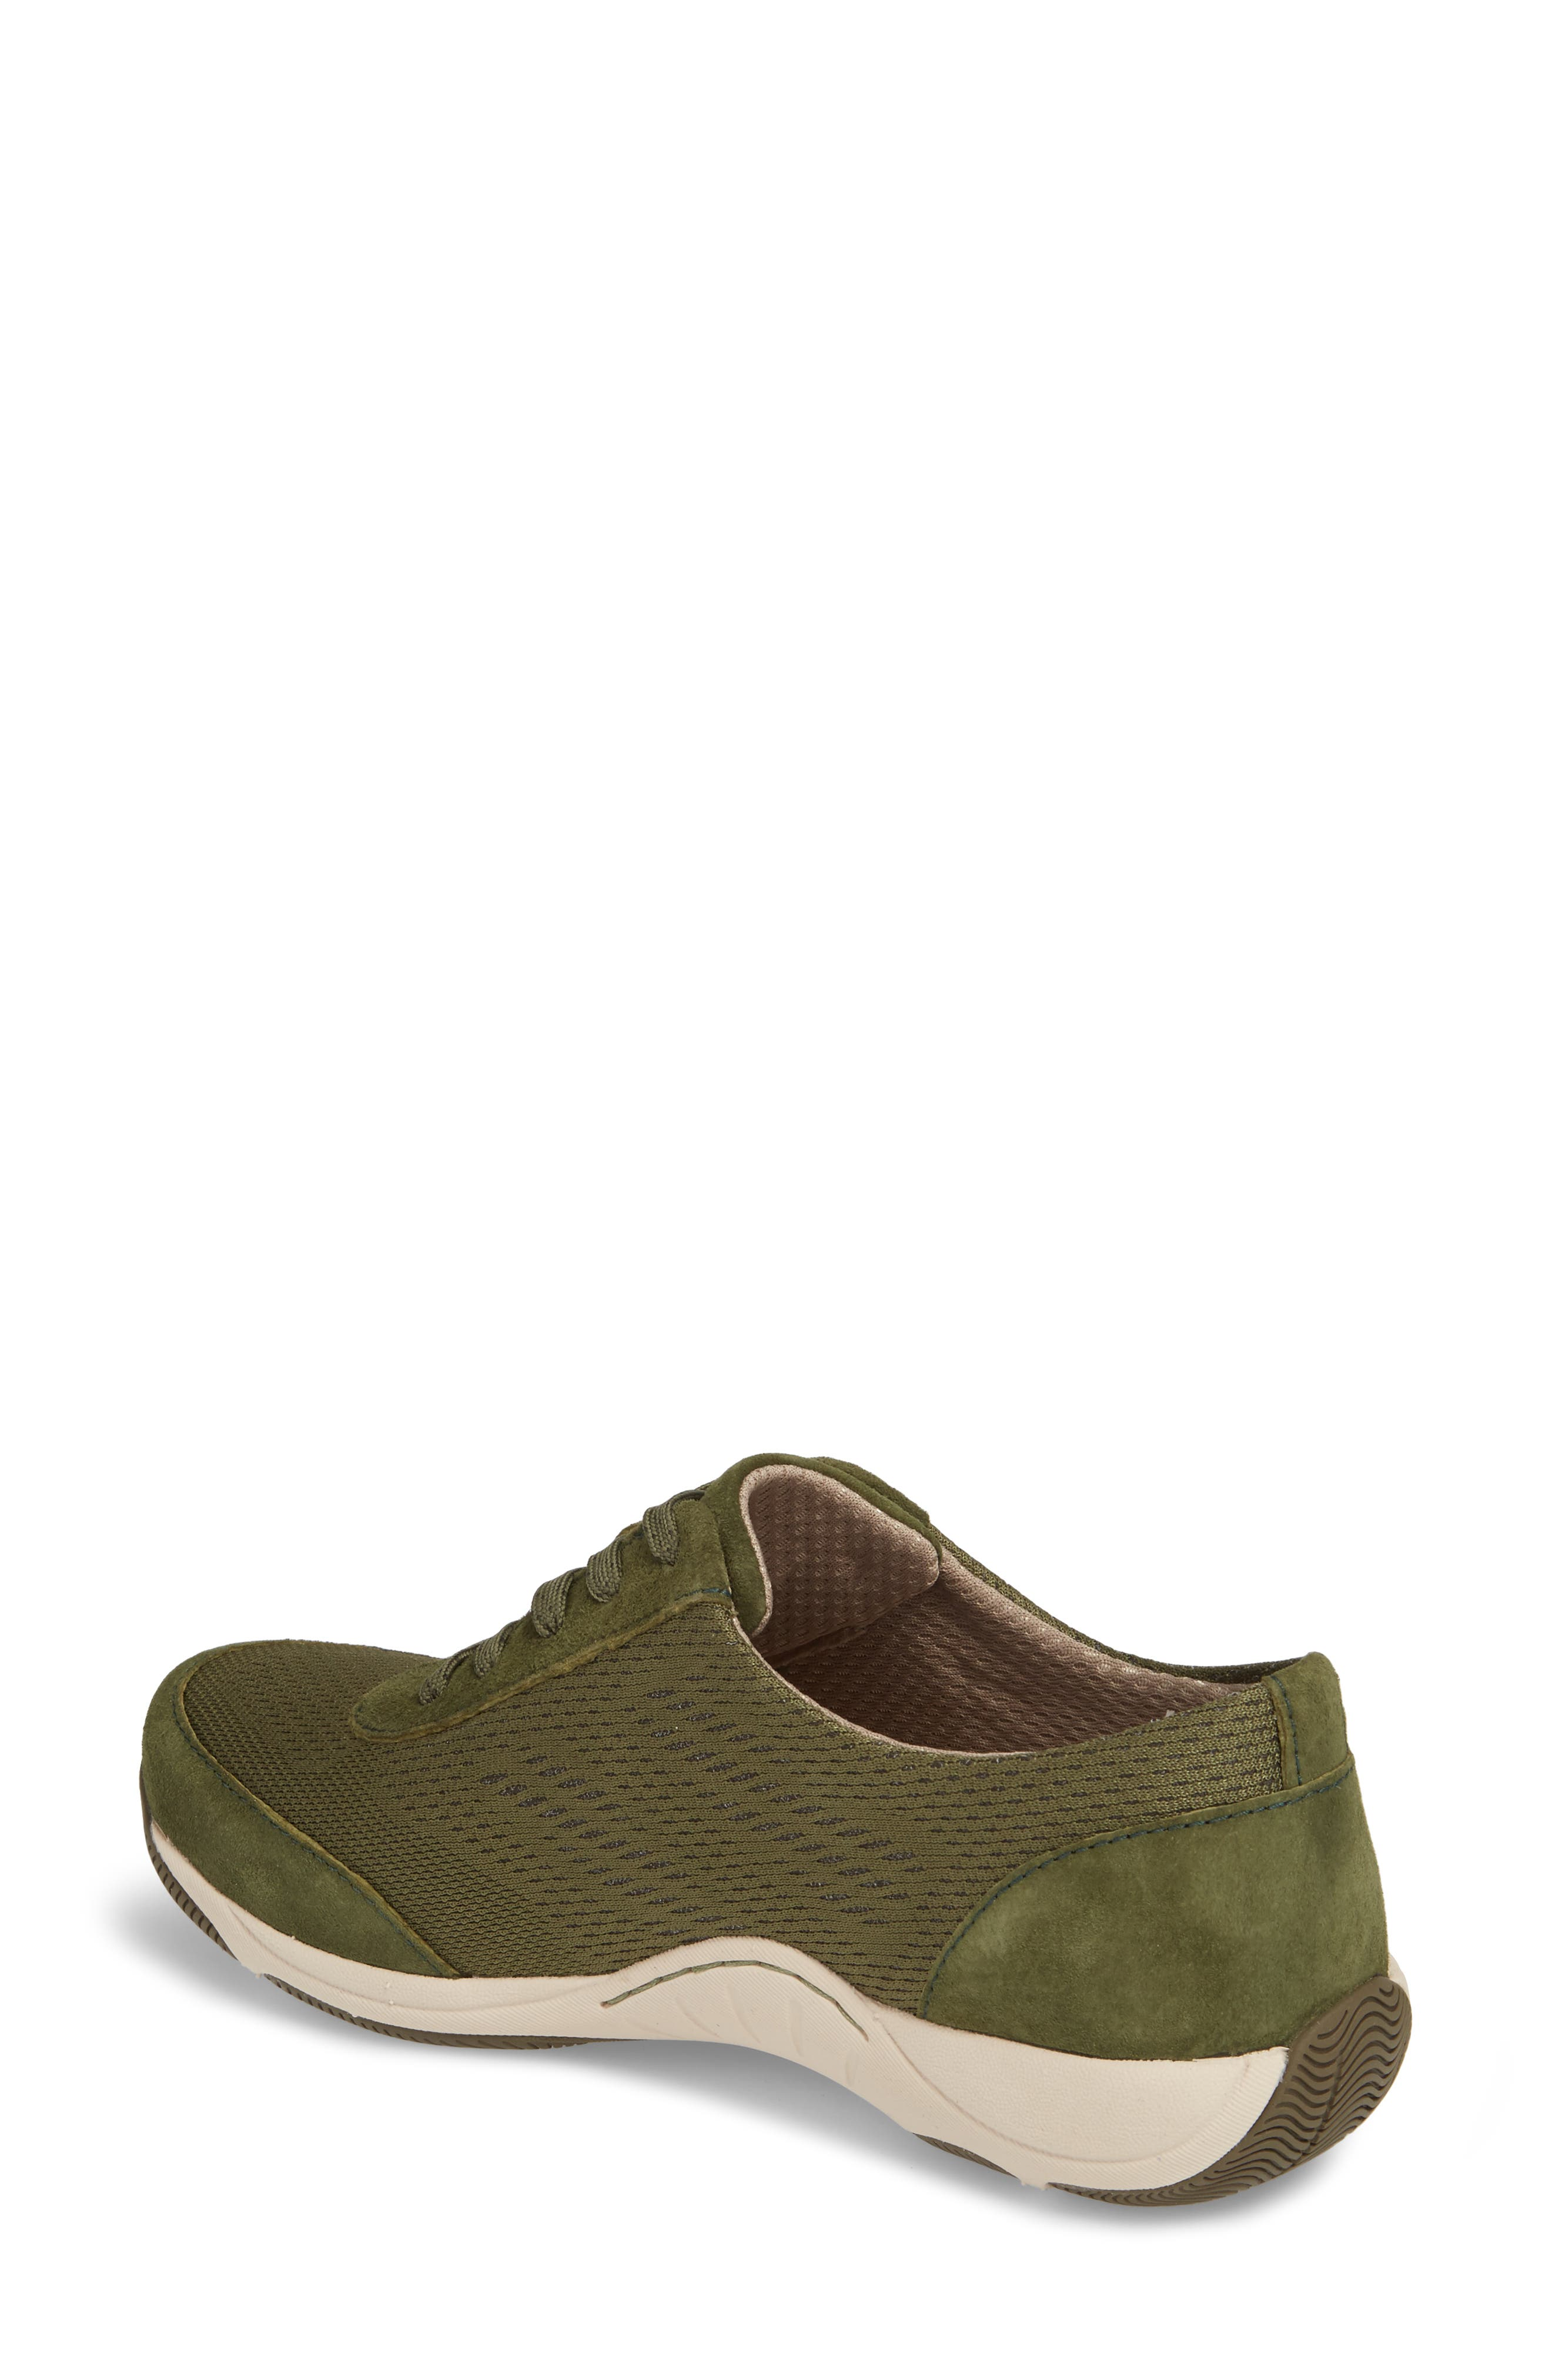 Hayes Sneaker,                             Alternate thumbnail 8, color,